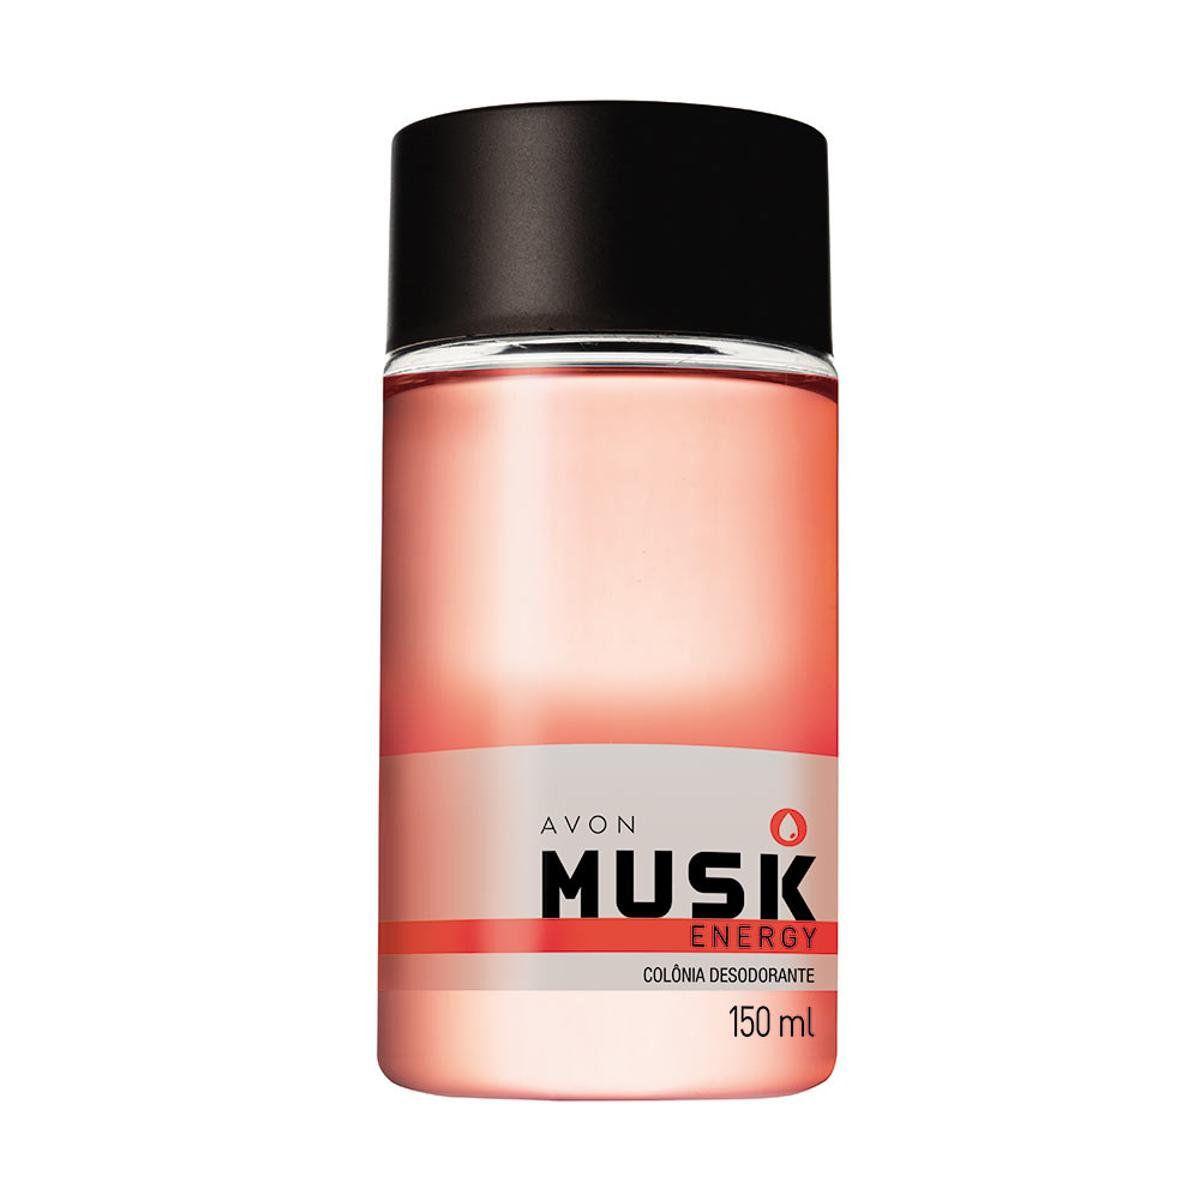 Colonia Desodorante Avon Musk Energy 150ml  - LUISA PERFUMARIA E COSMETICOS